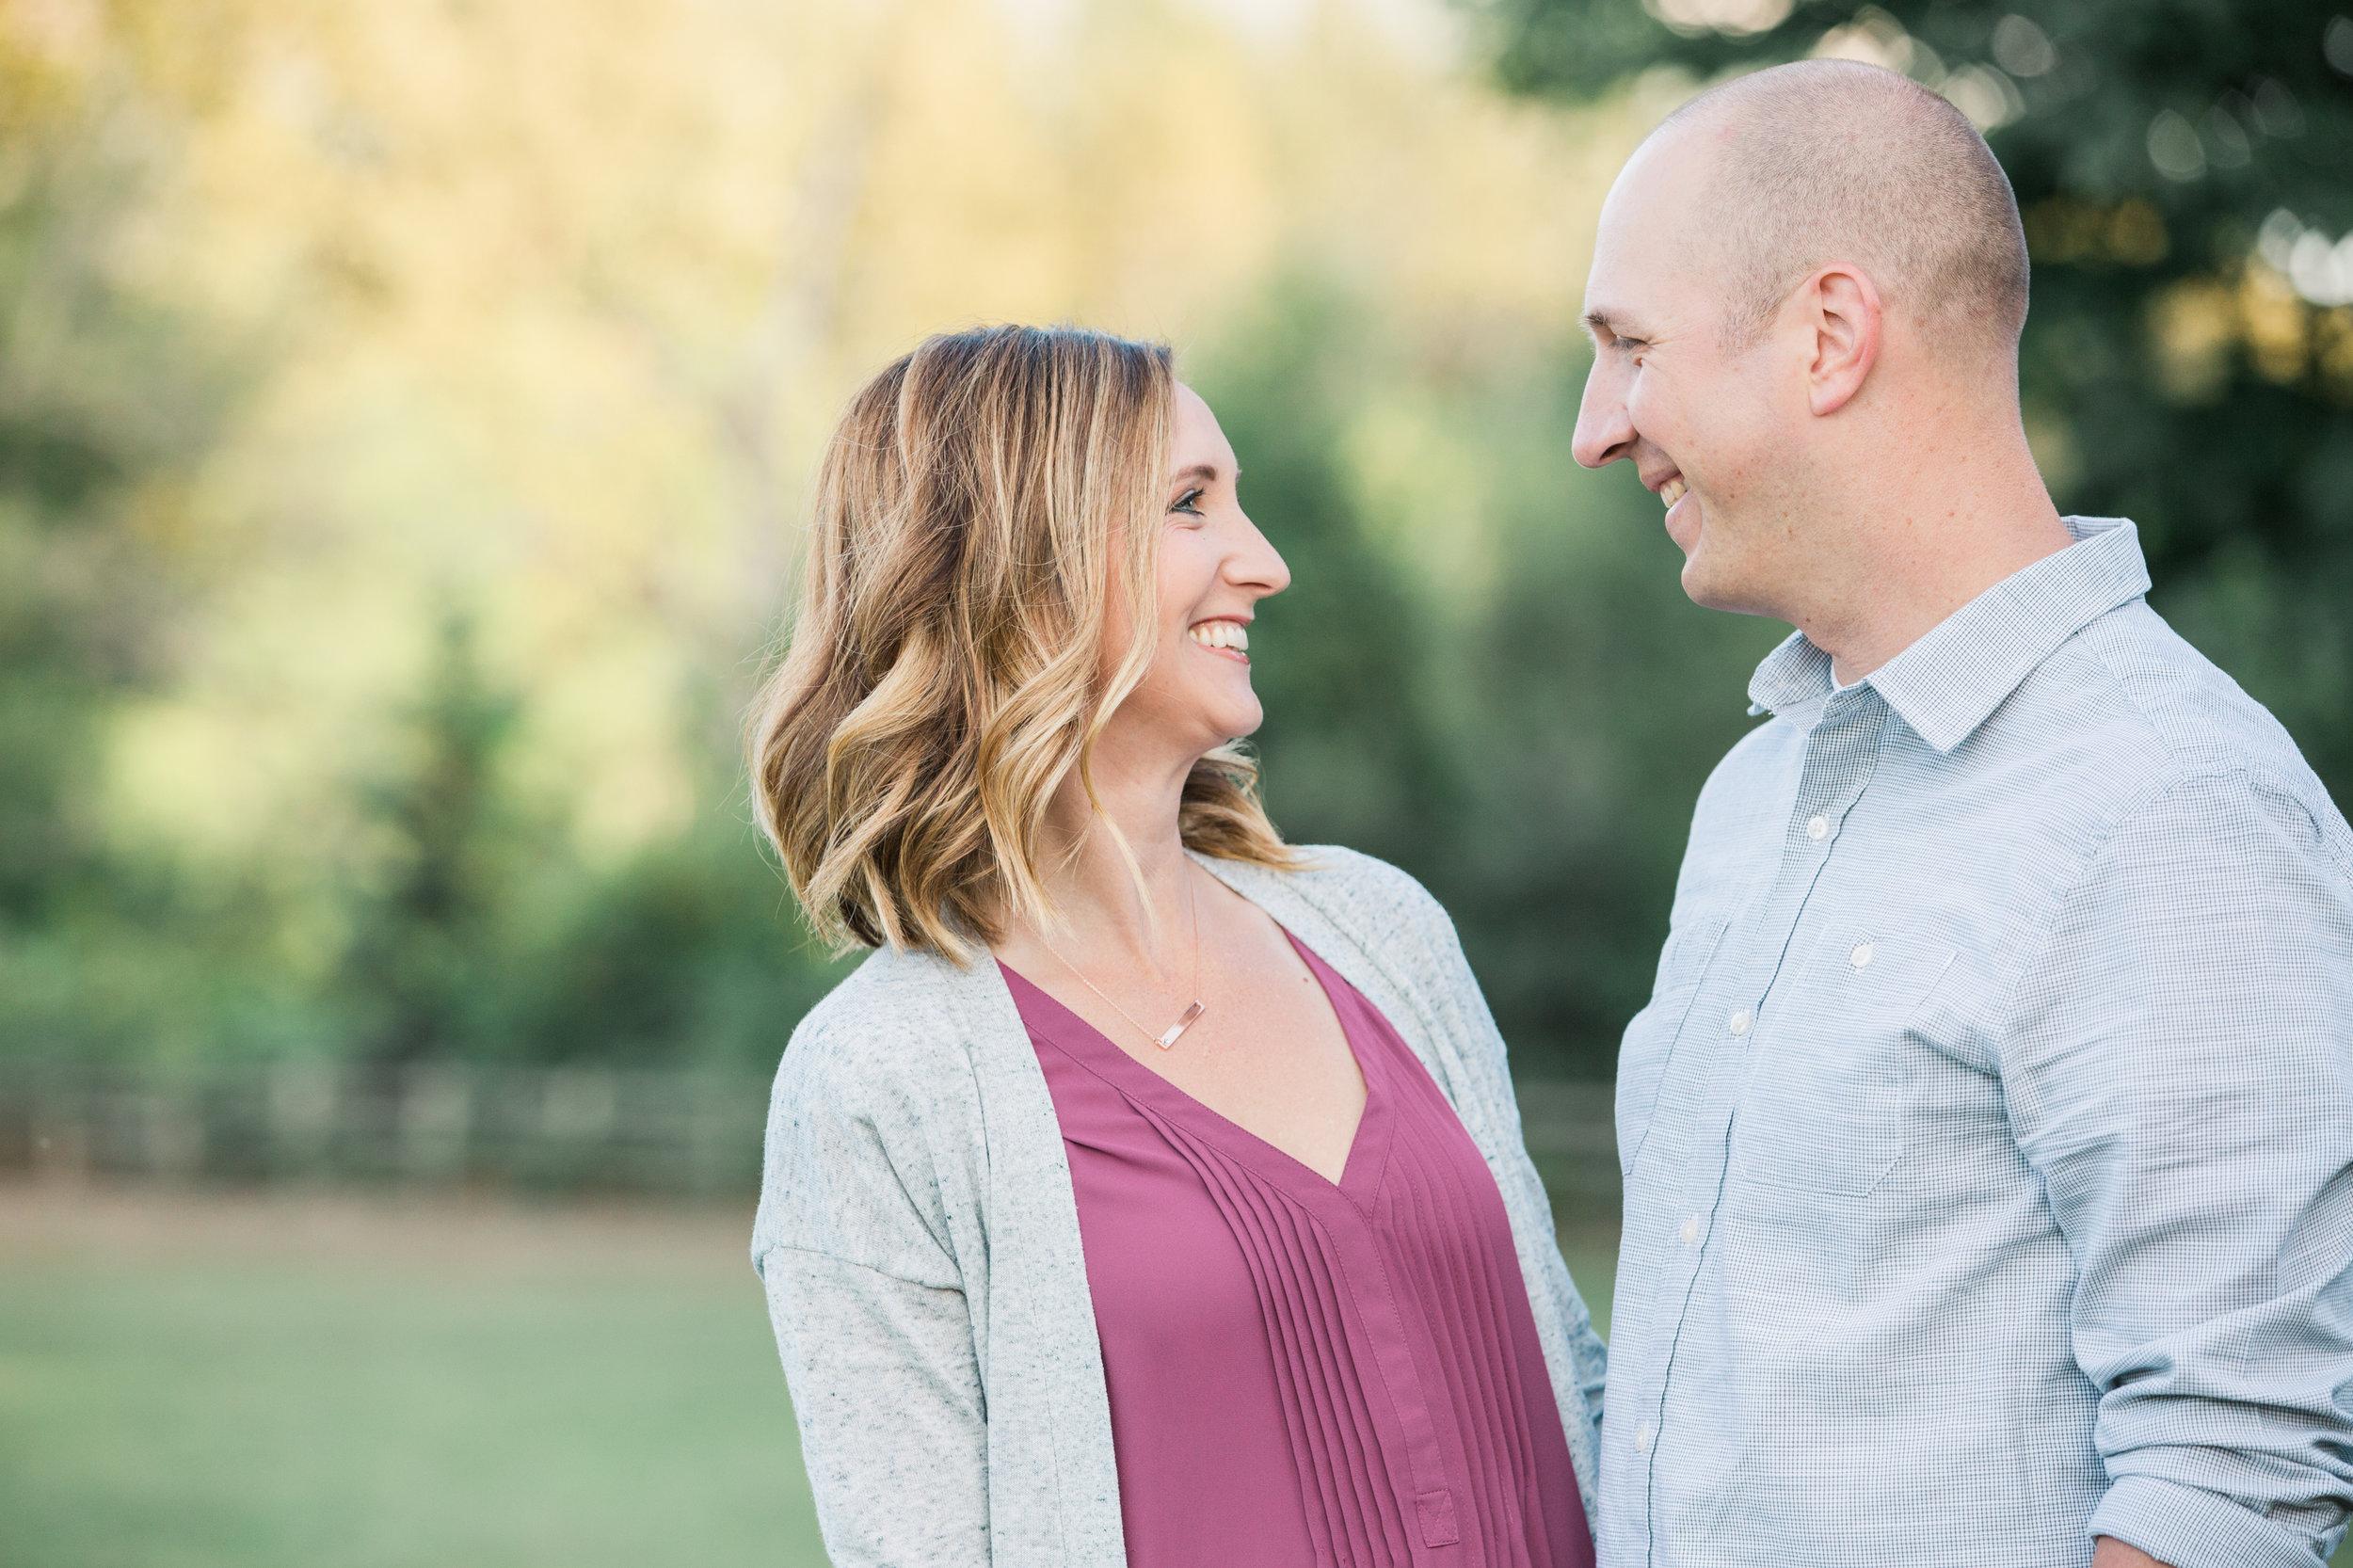 Eden & Me Photography | Seattle Portrait and Wedding Photographer | Issaquah Photographer | North Bend | Mountains15